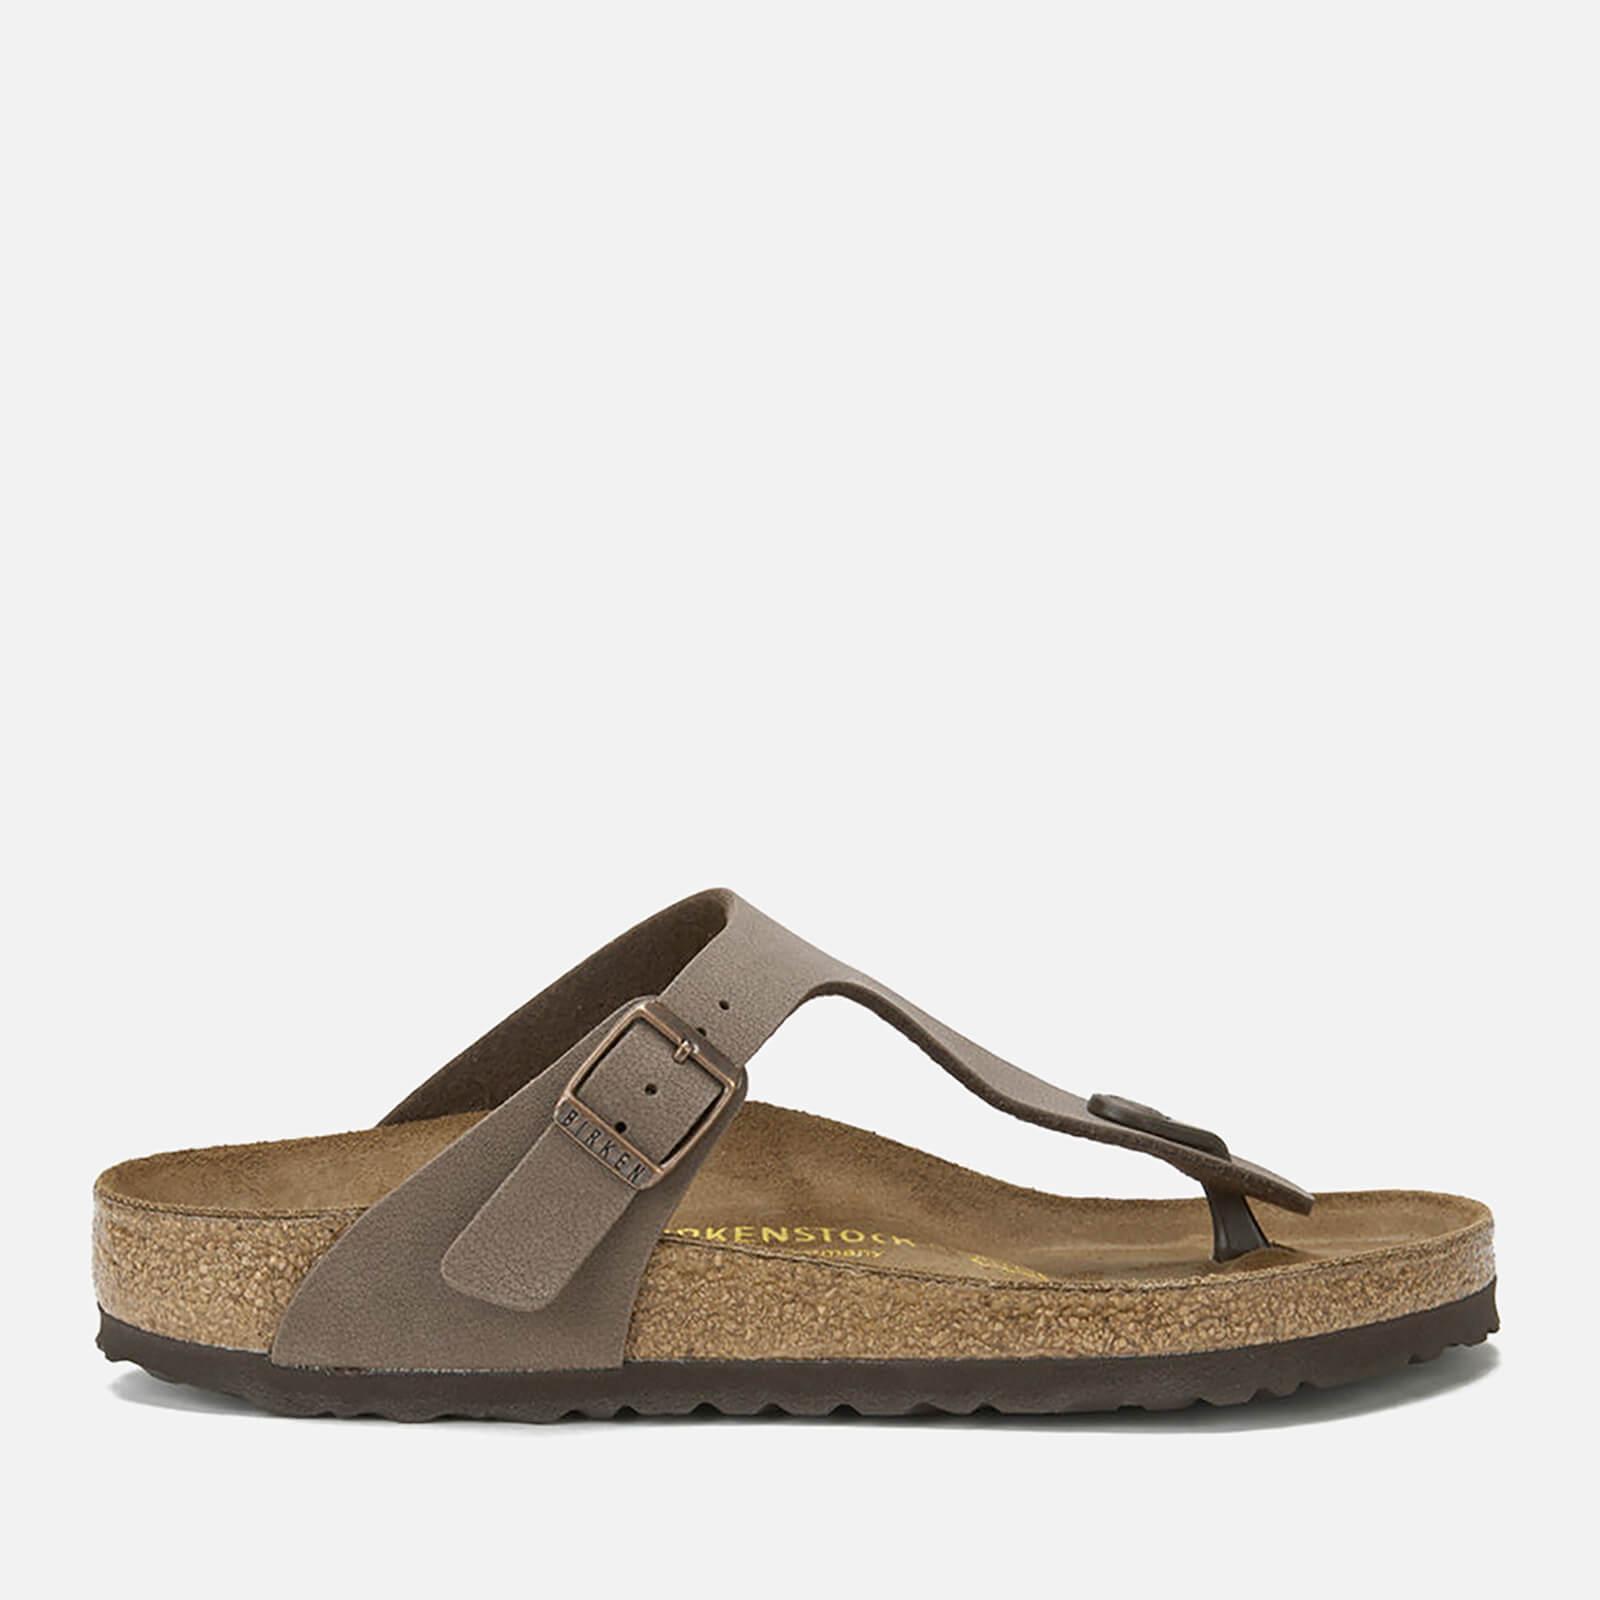 Birkenstock Women's Gizeh Toe-Post Sandals - Mocha - EU 41/UK 7.5